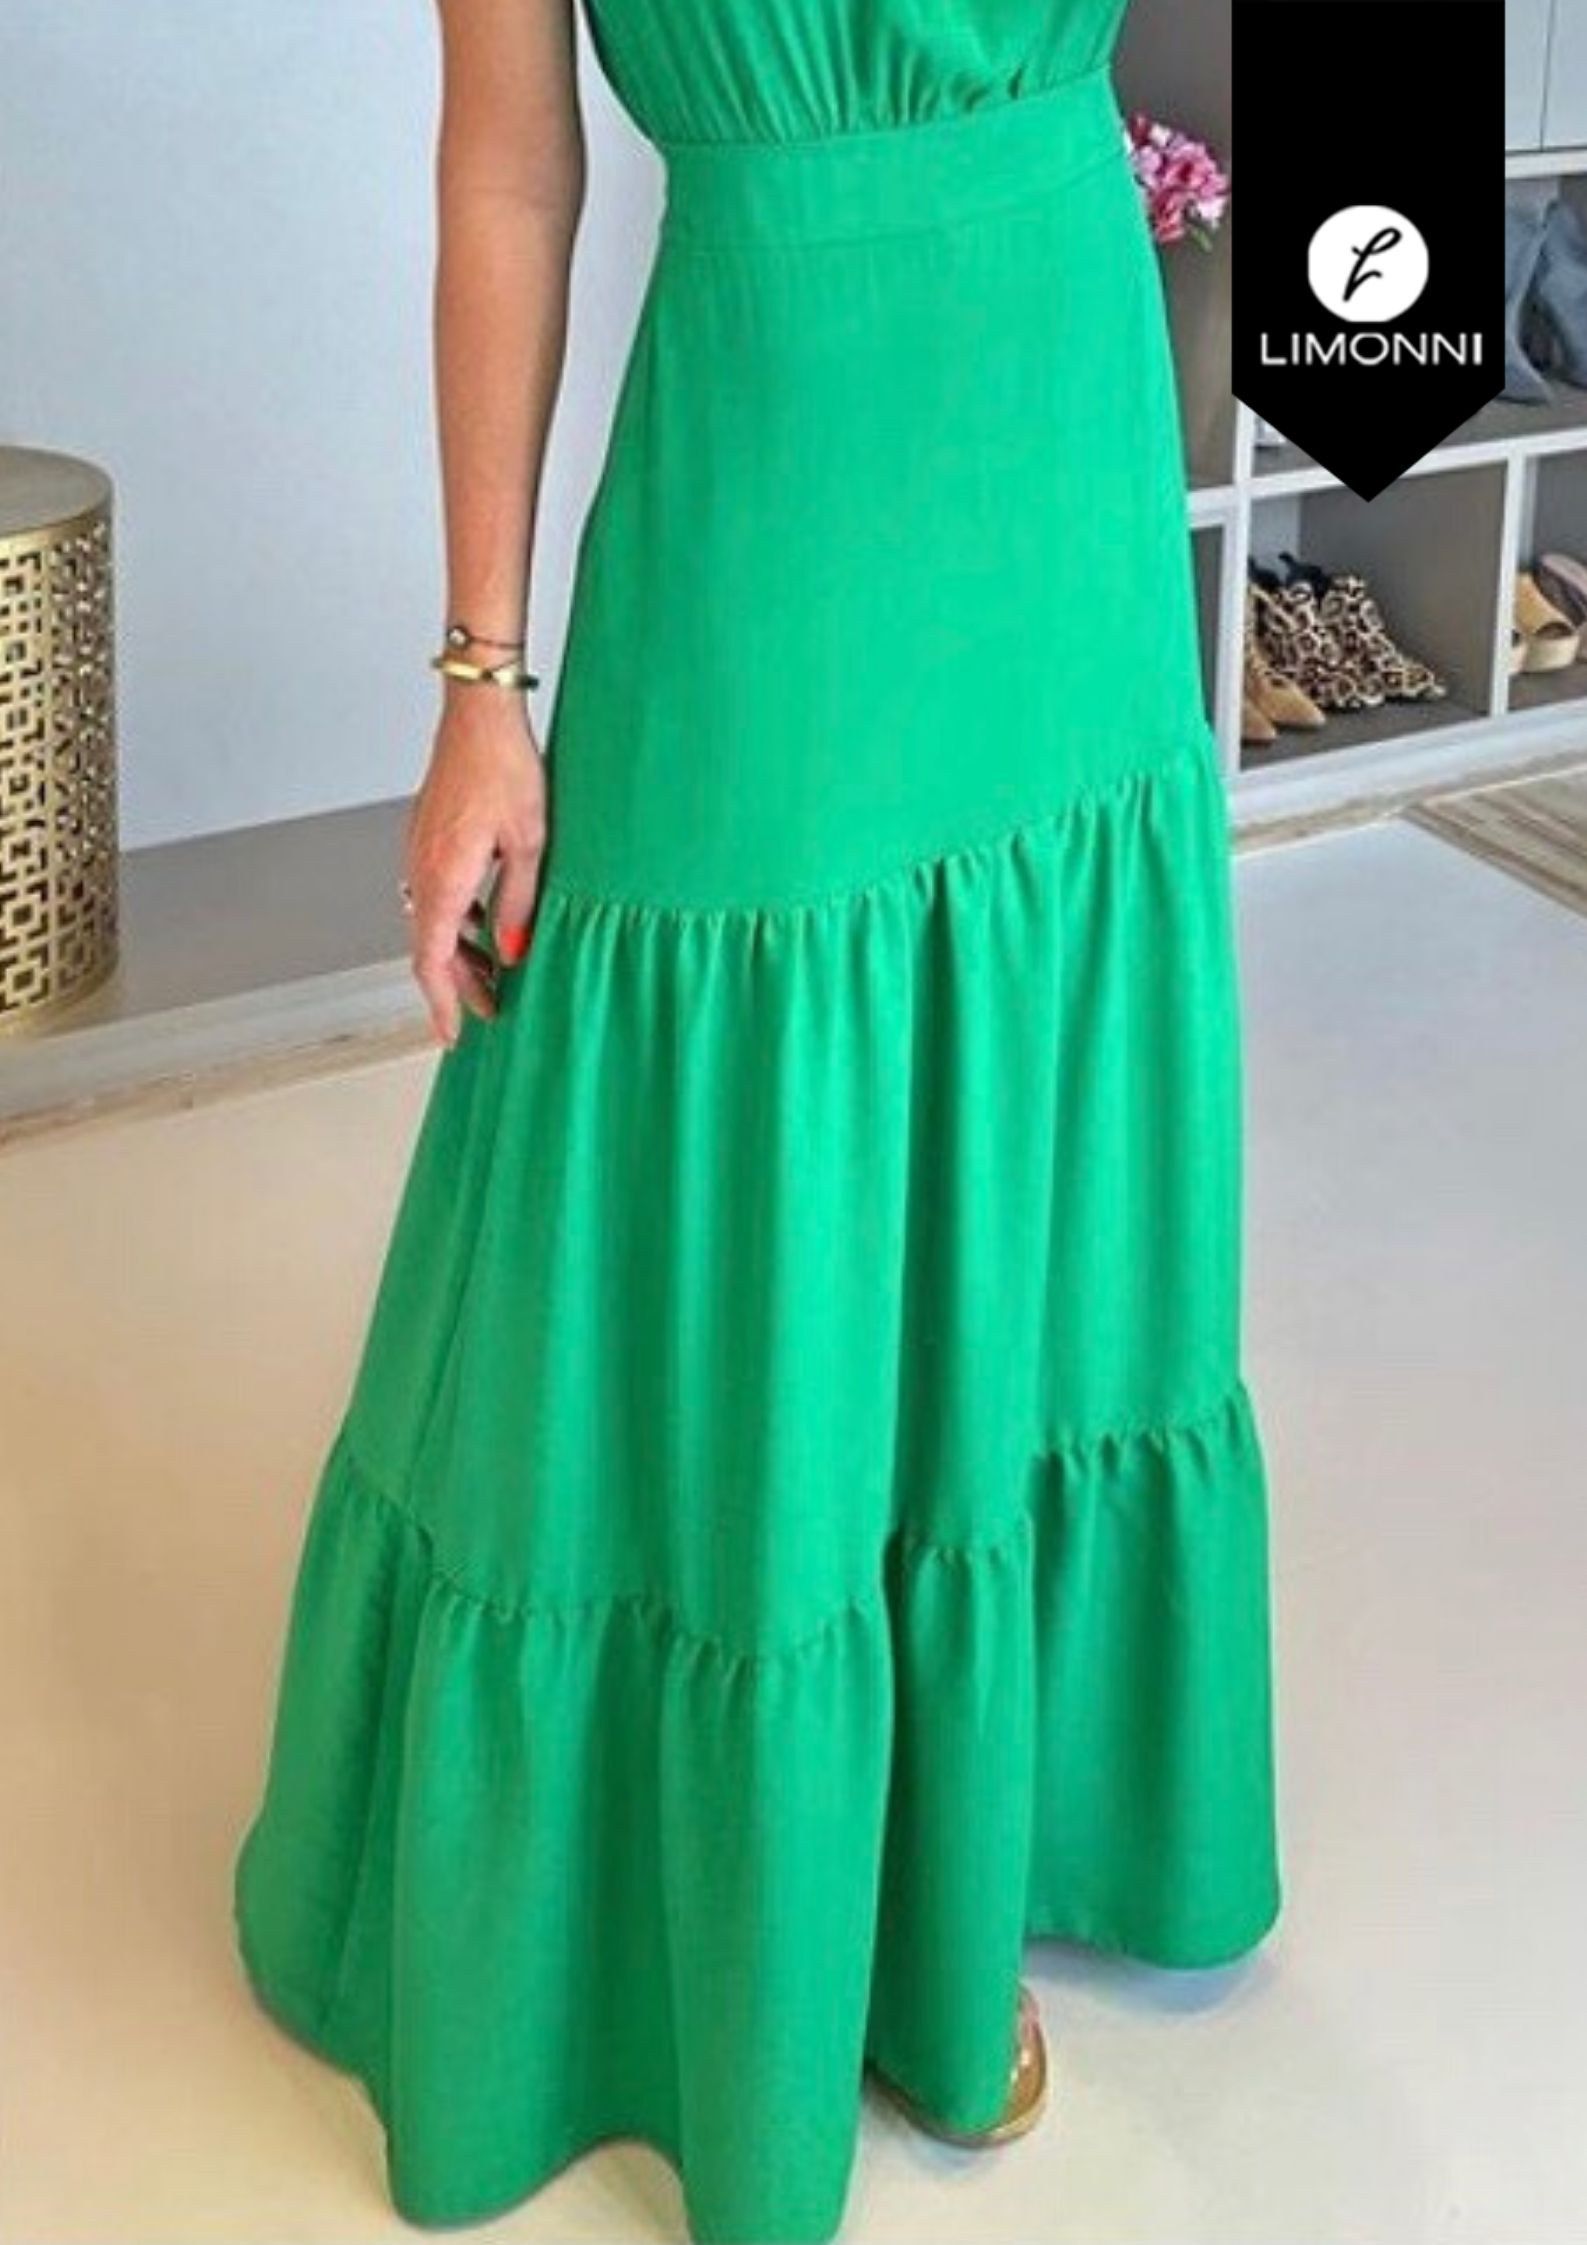 Faldas para mujer Limonni Visionary LI3071 Largos elegantes